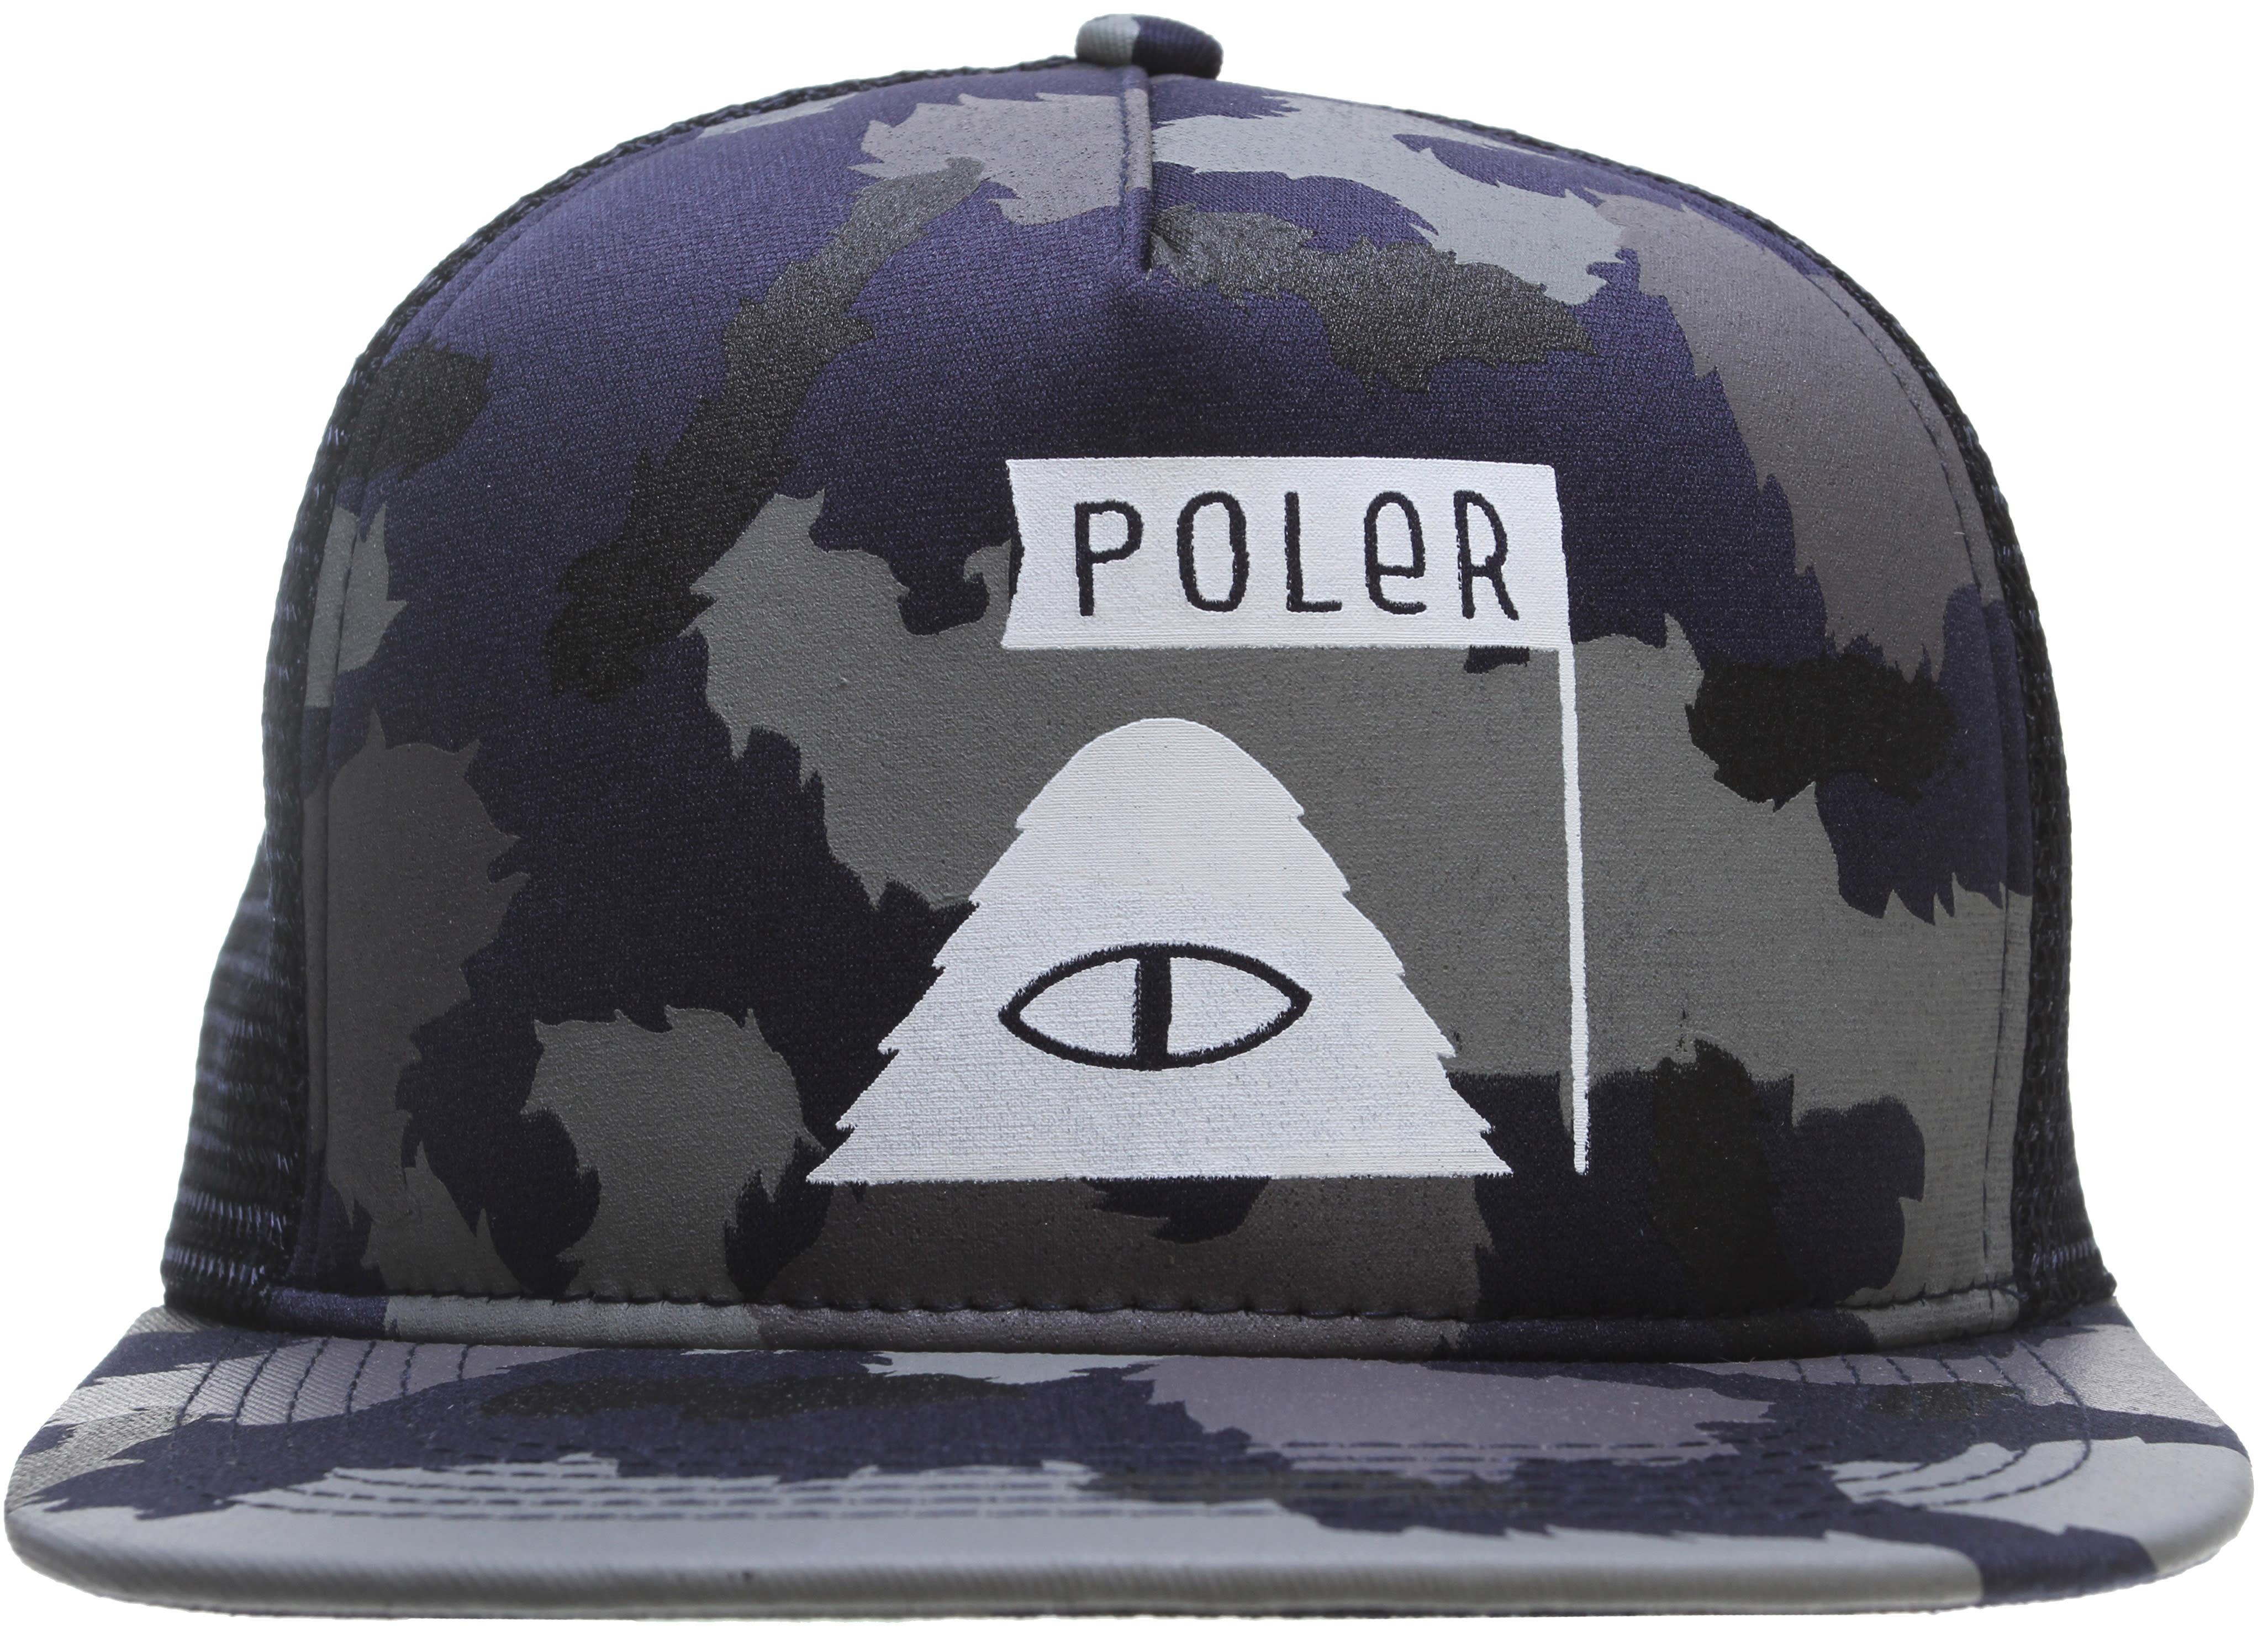 Poler Summit Mesh Trucker Cap - thumbnail 1 fe6bf7a2d8c